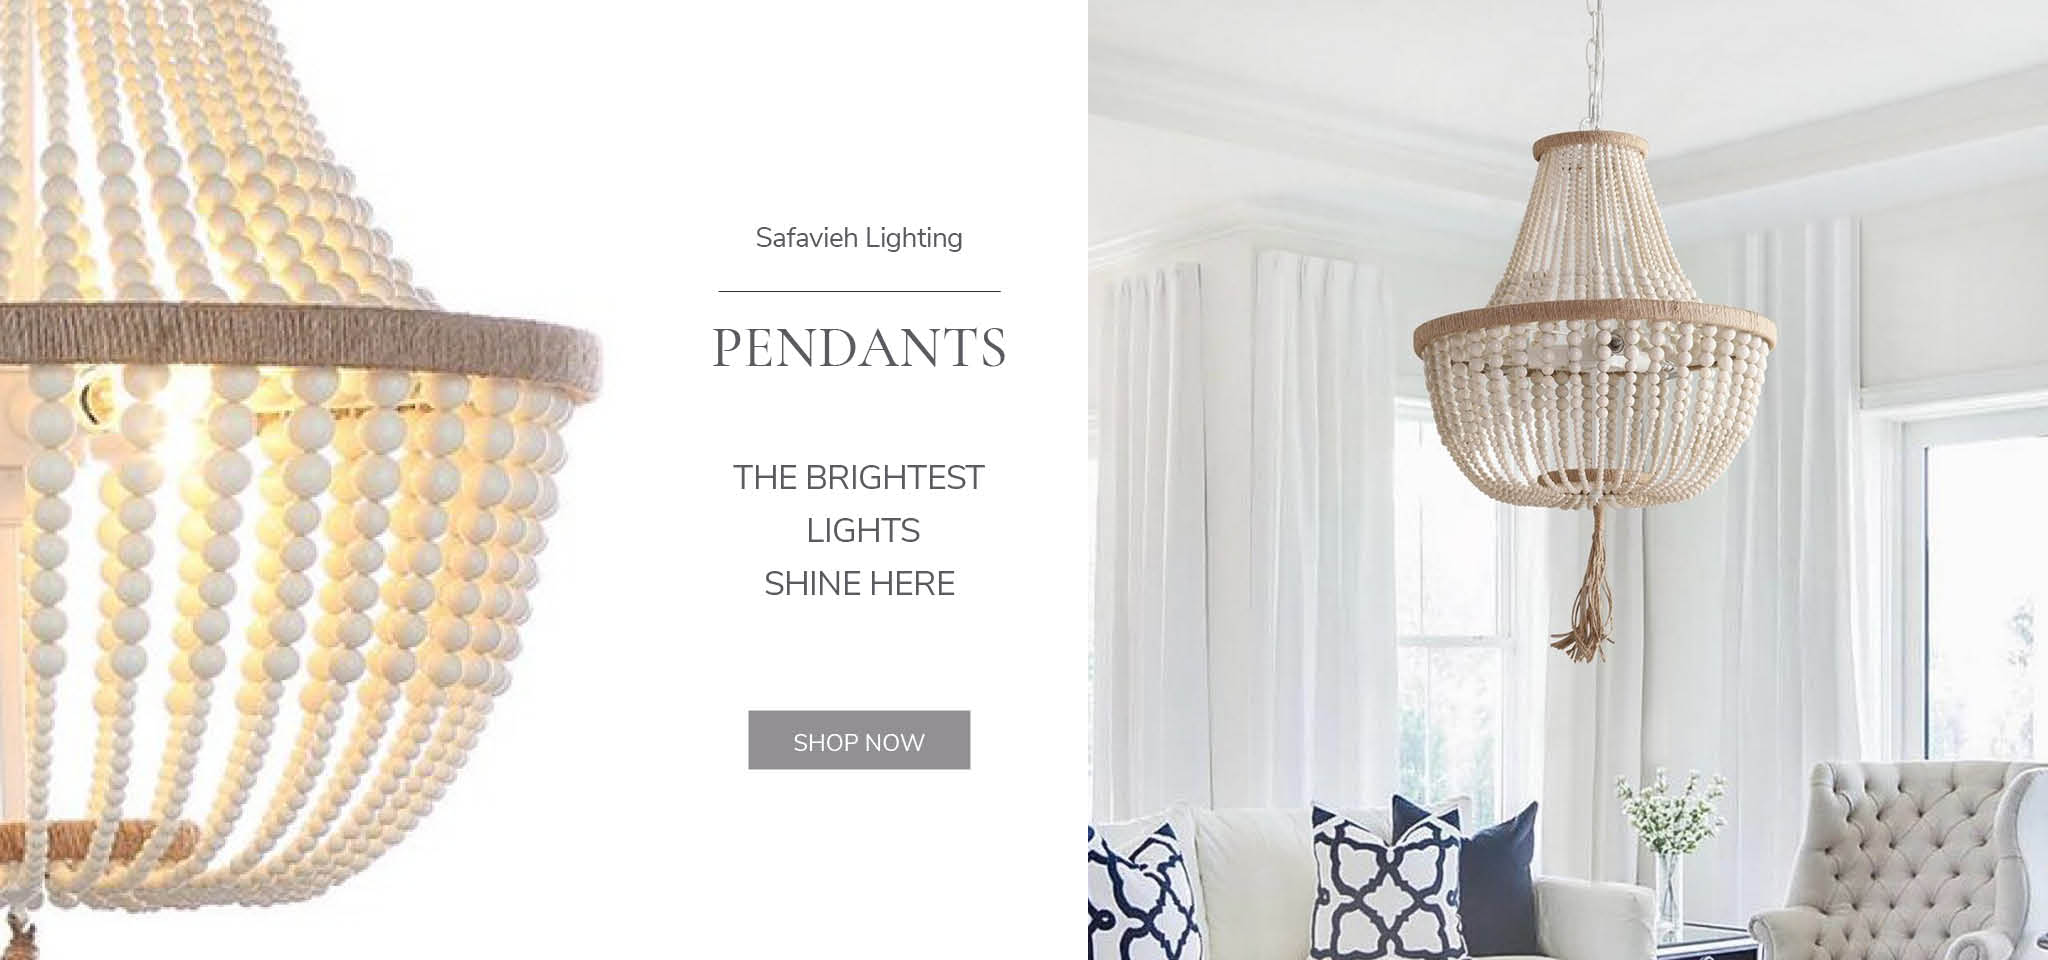 Safavieh Lighting - Pendants